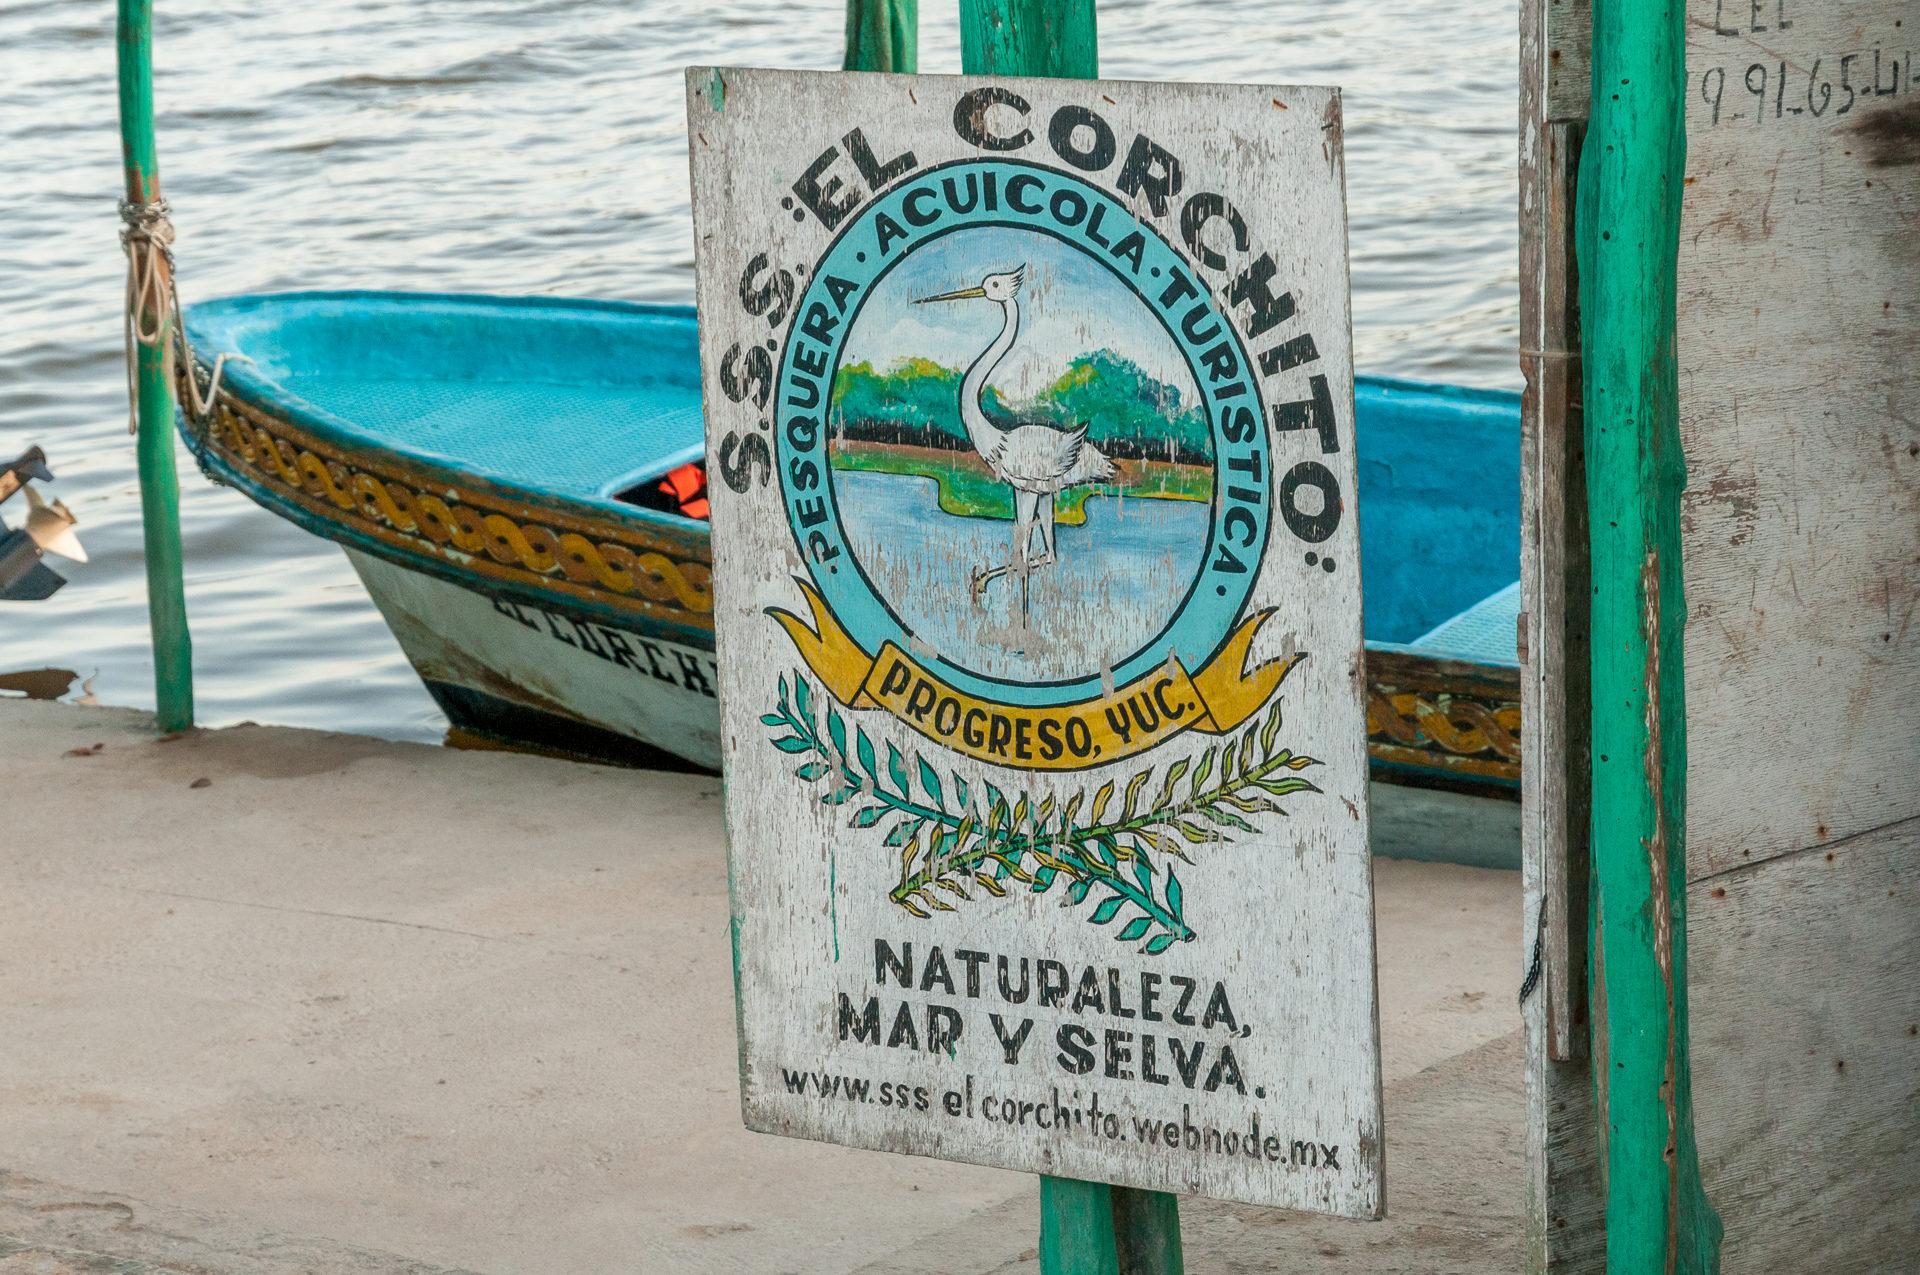 Boote zu dem Naturschutzgebiet